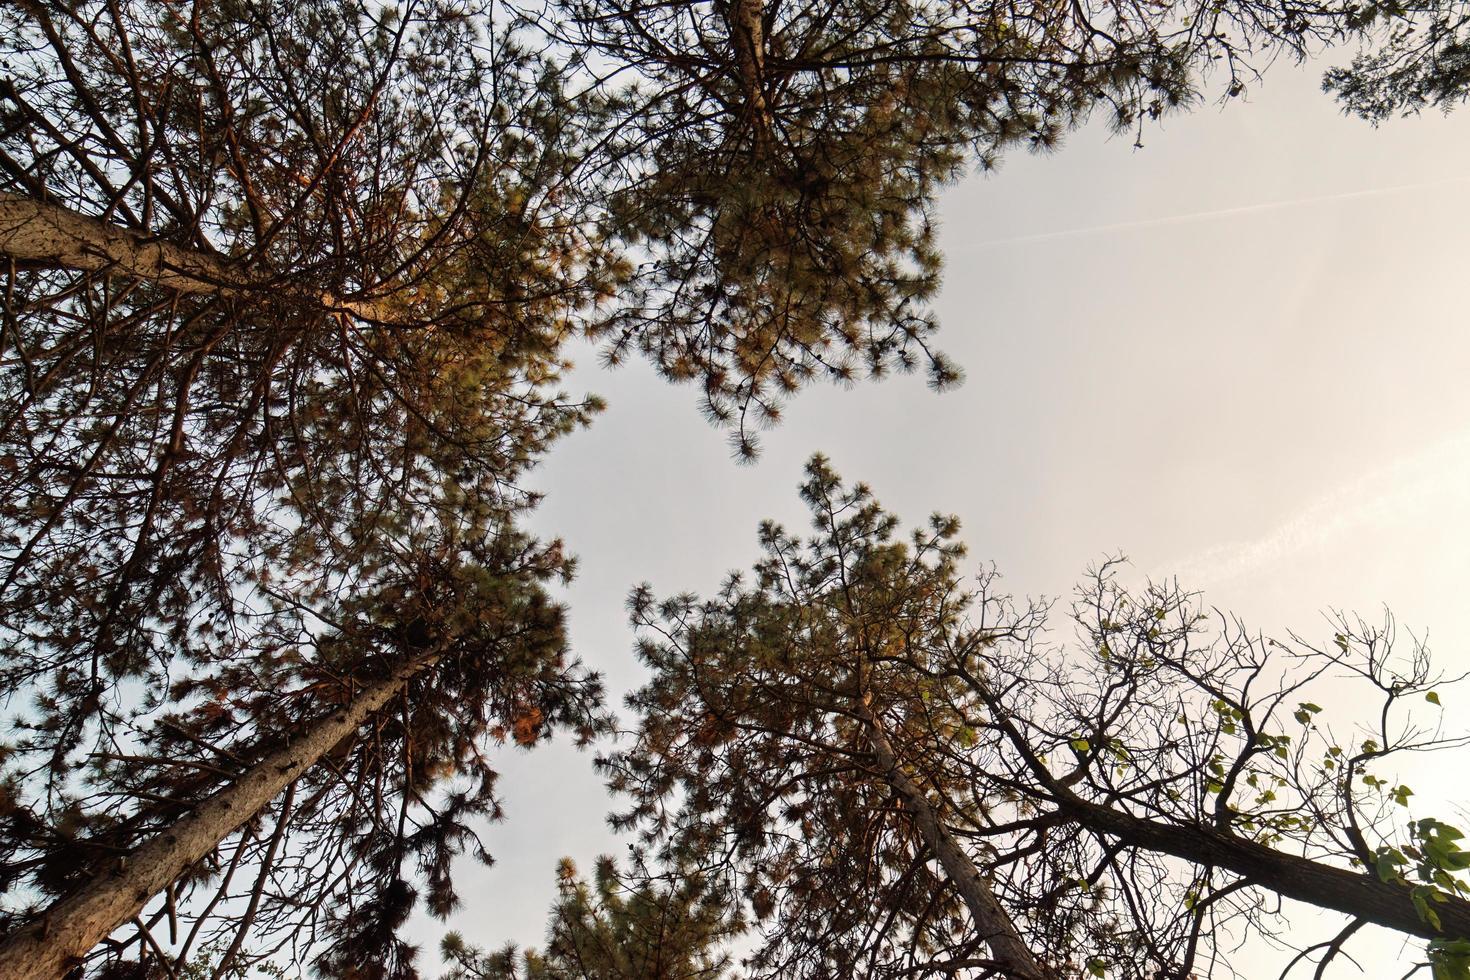 Tree foliage in autumn days photo